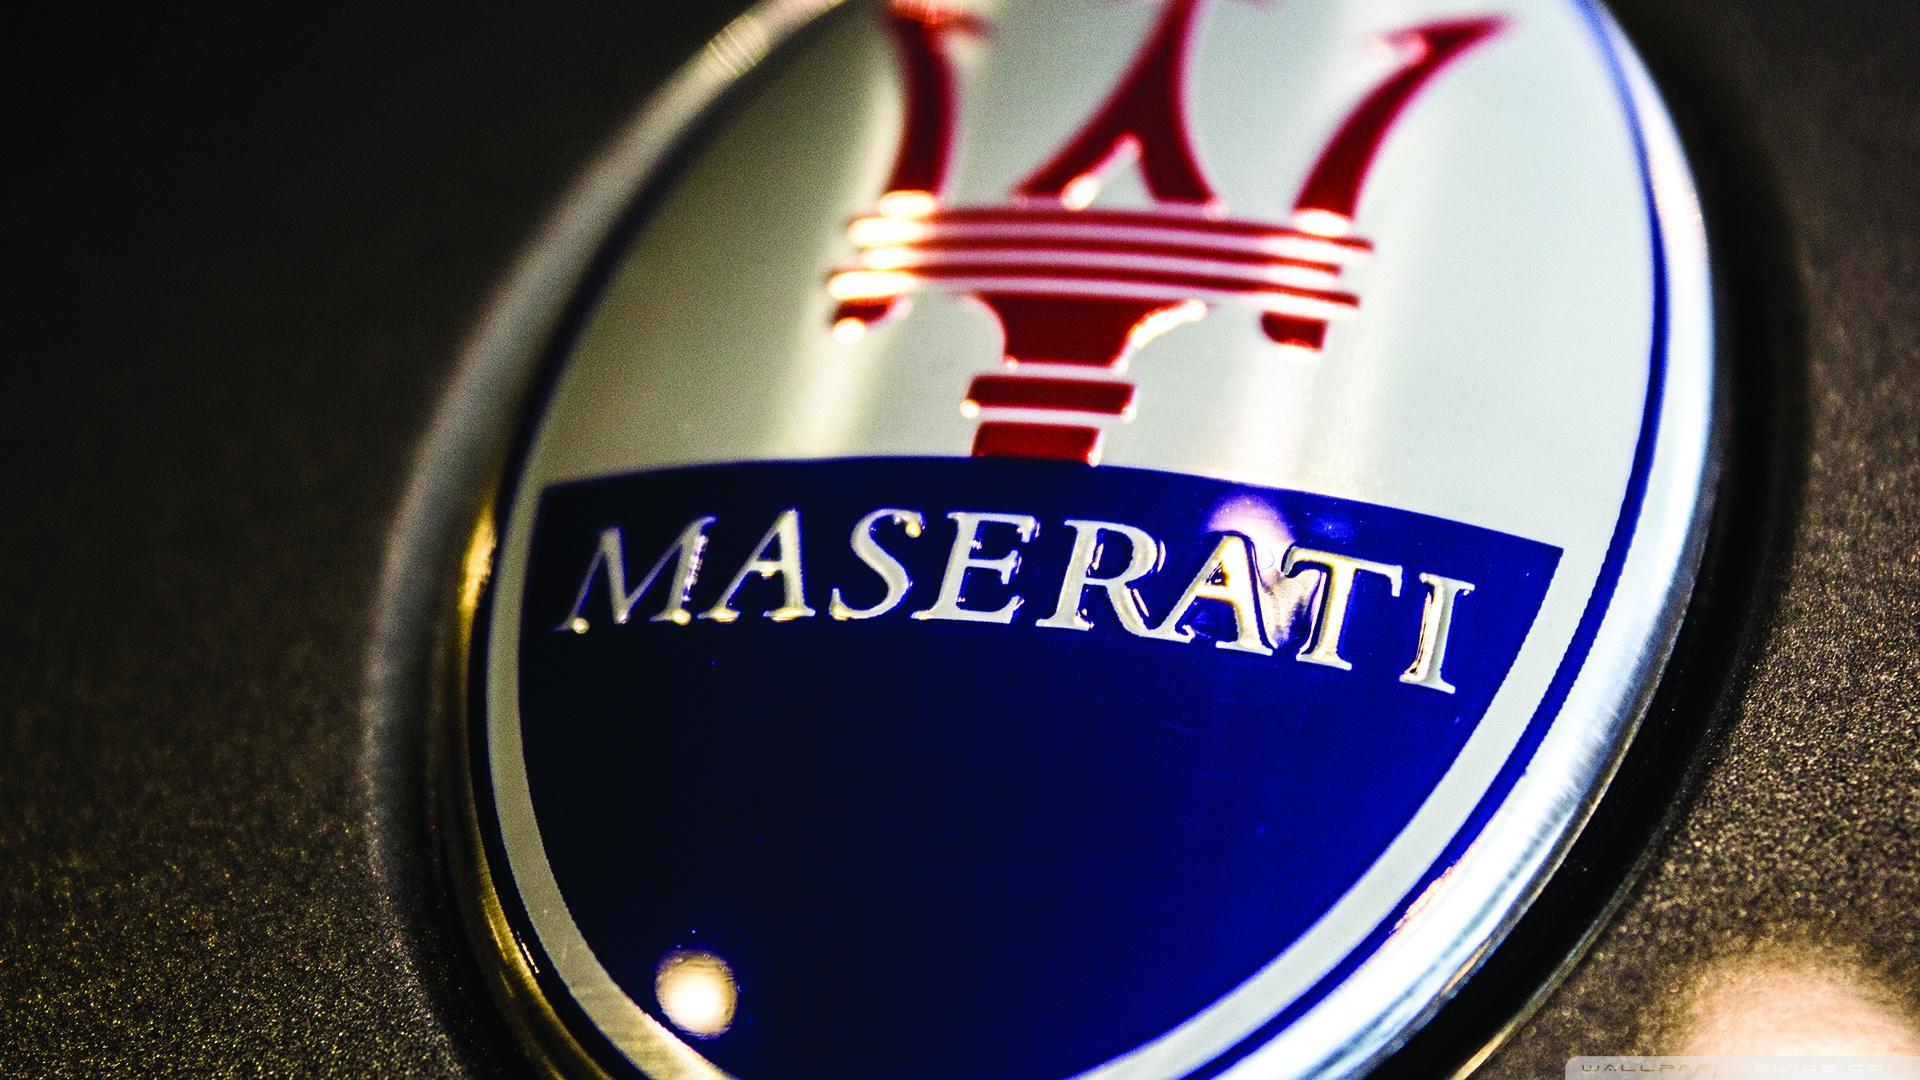 maserati logo wallpaper 4jpg 1920x1080